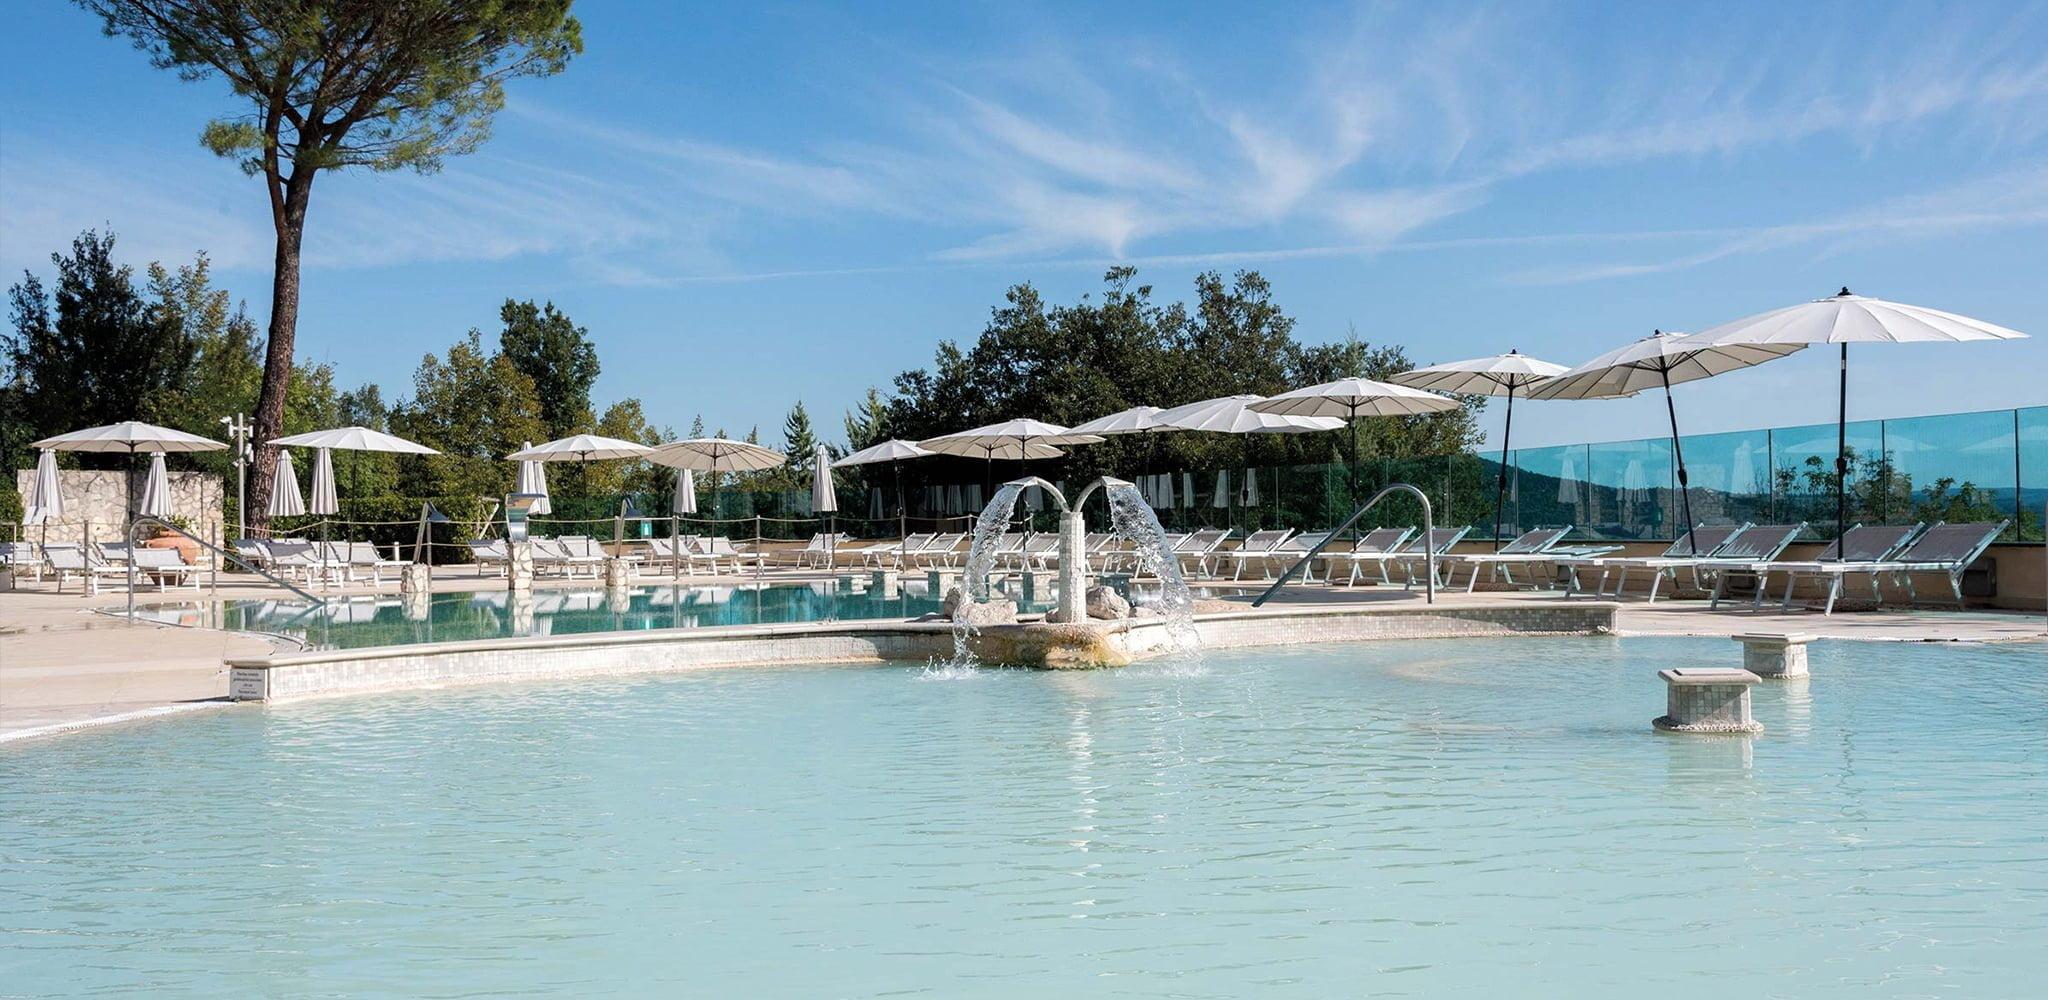 Hotel Mercure Petriolo Siena Terme Spa